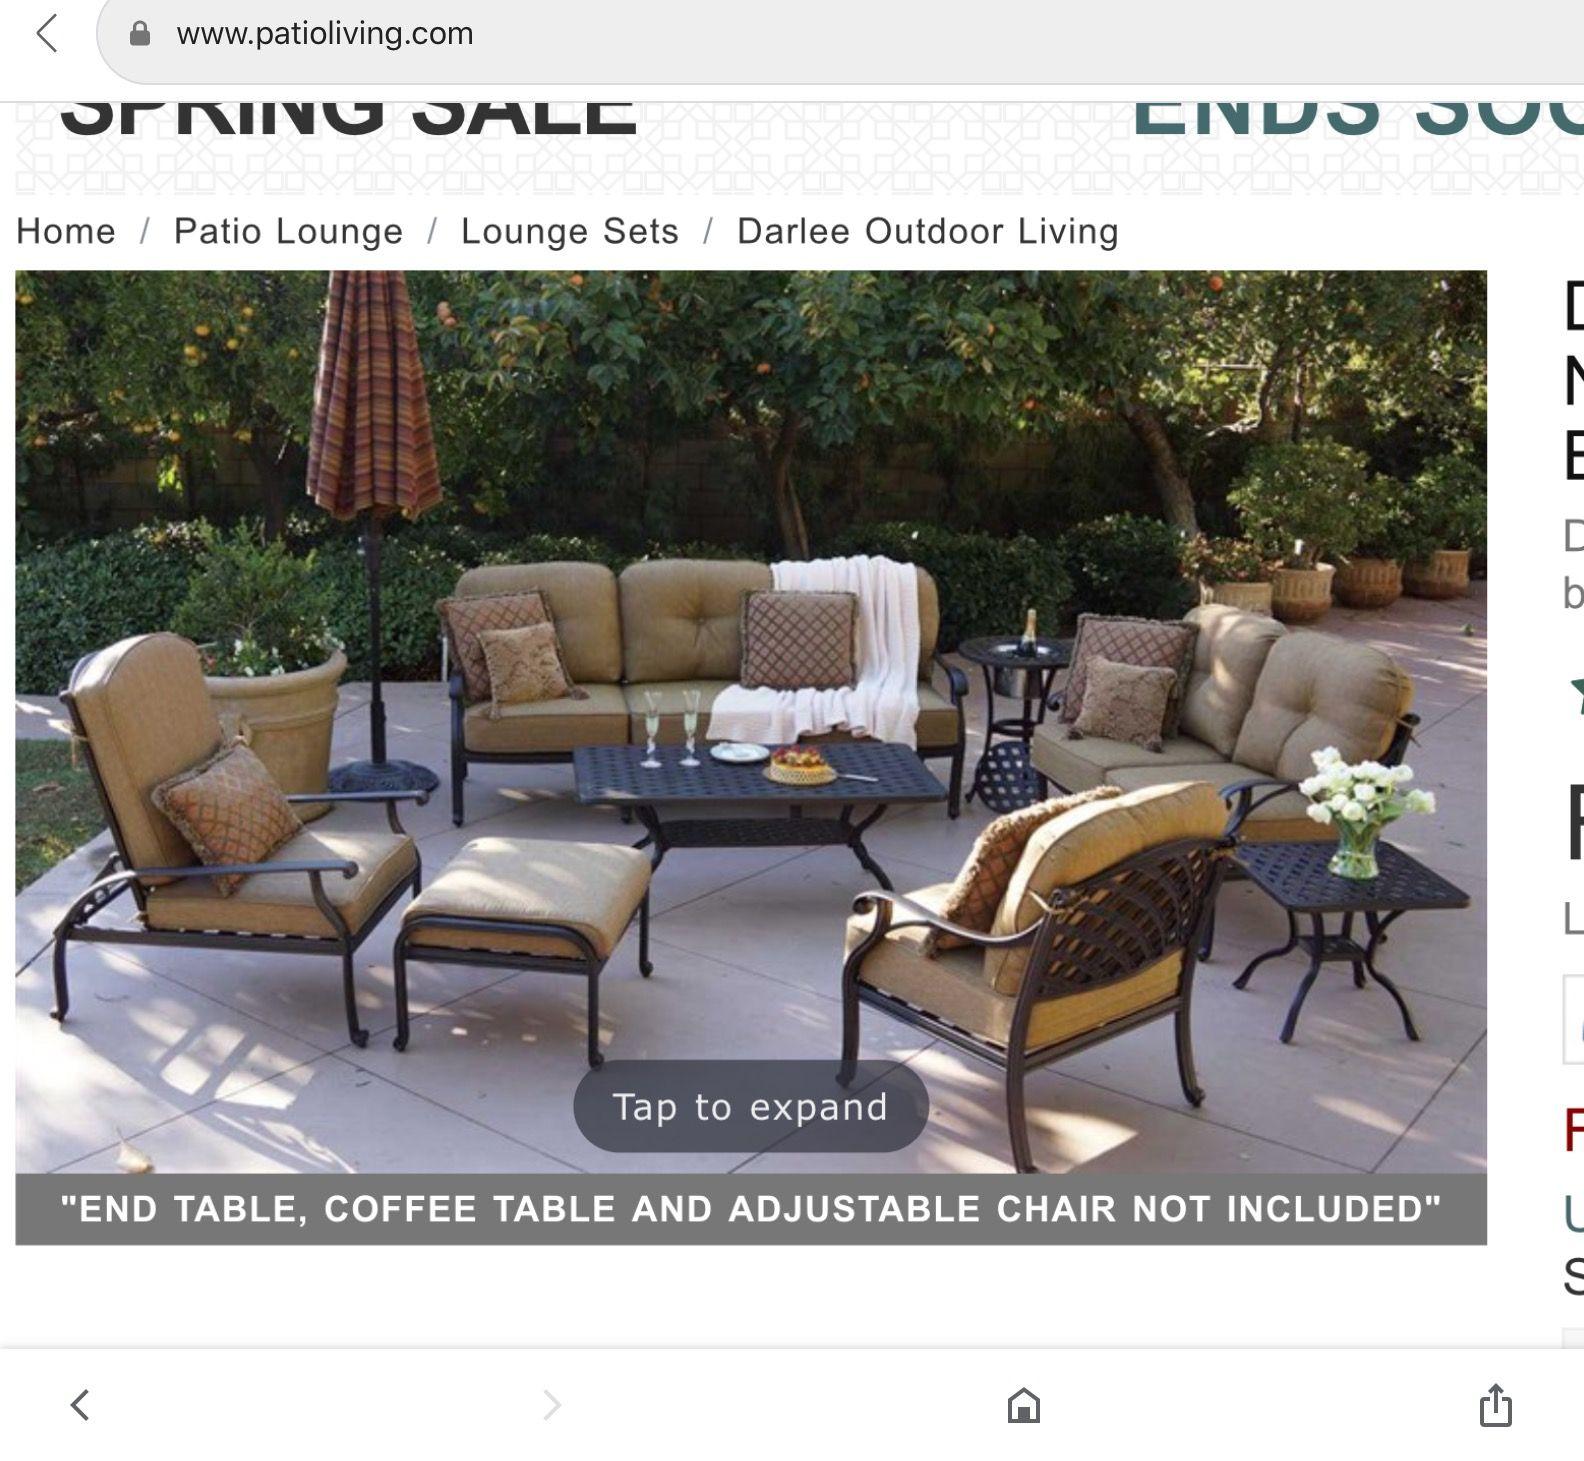 Patio Living Com In 2020 Patio Cushions Outdoor Patio Martha Stewart Patio Furniture